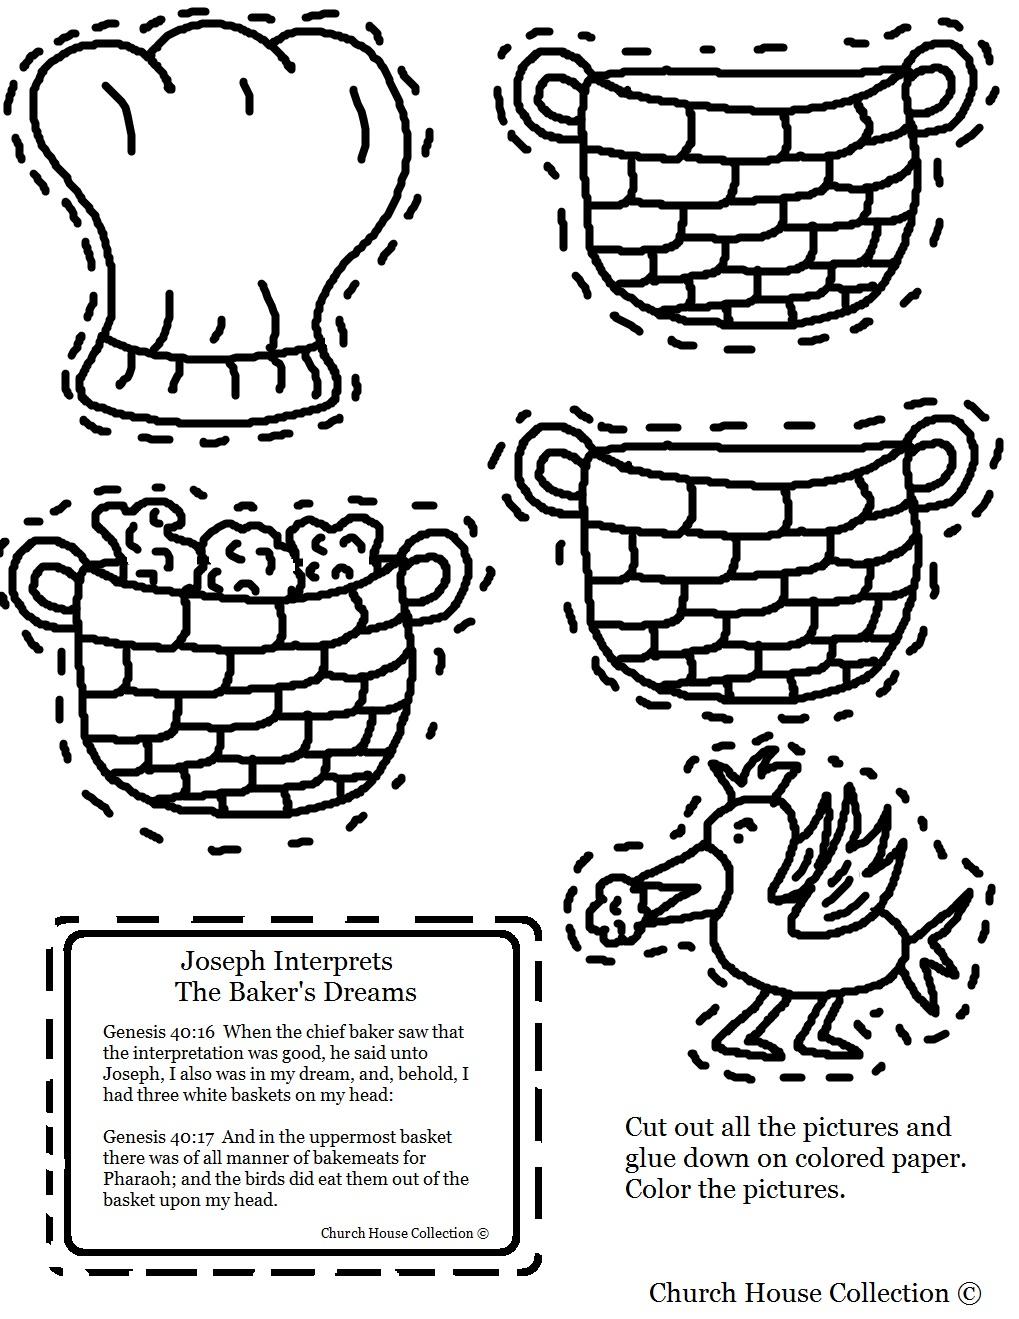 Church House Collection Blog: Joseph Interprets The Baker